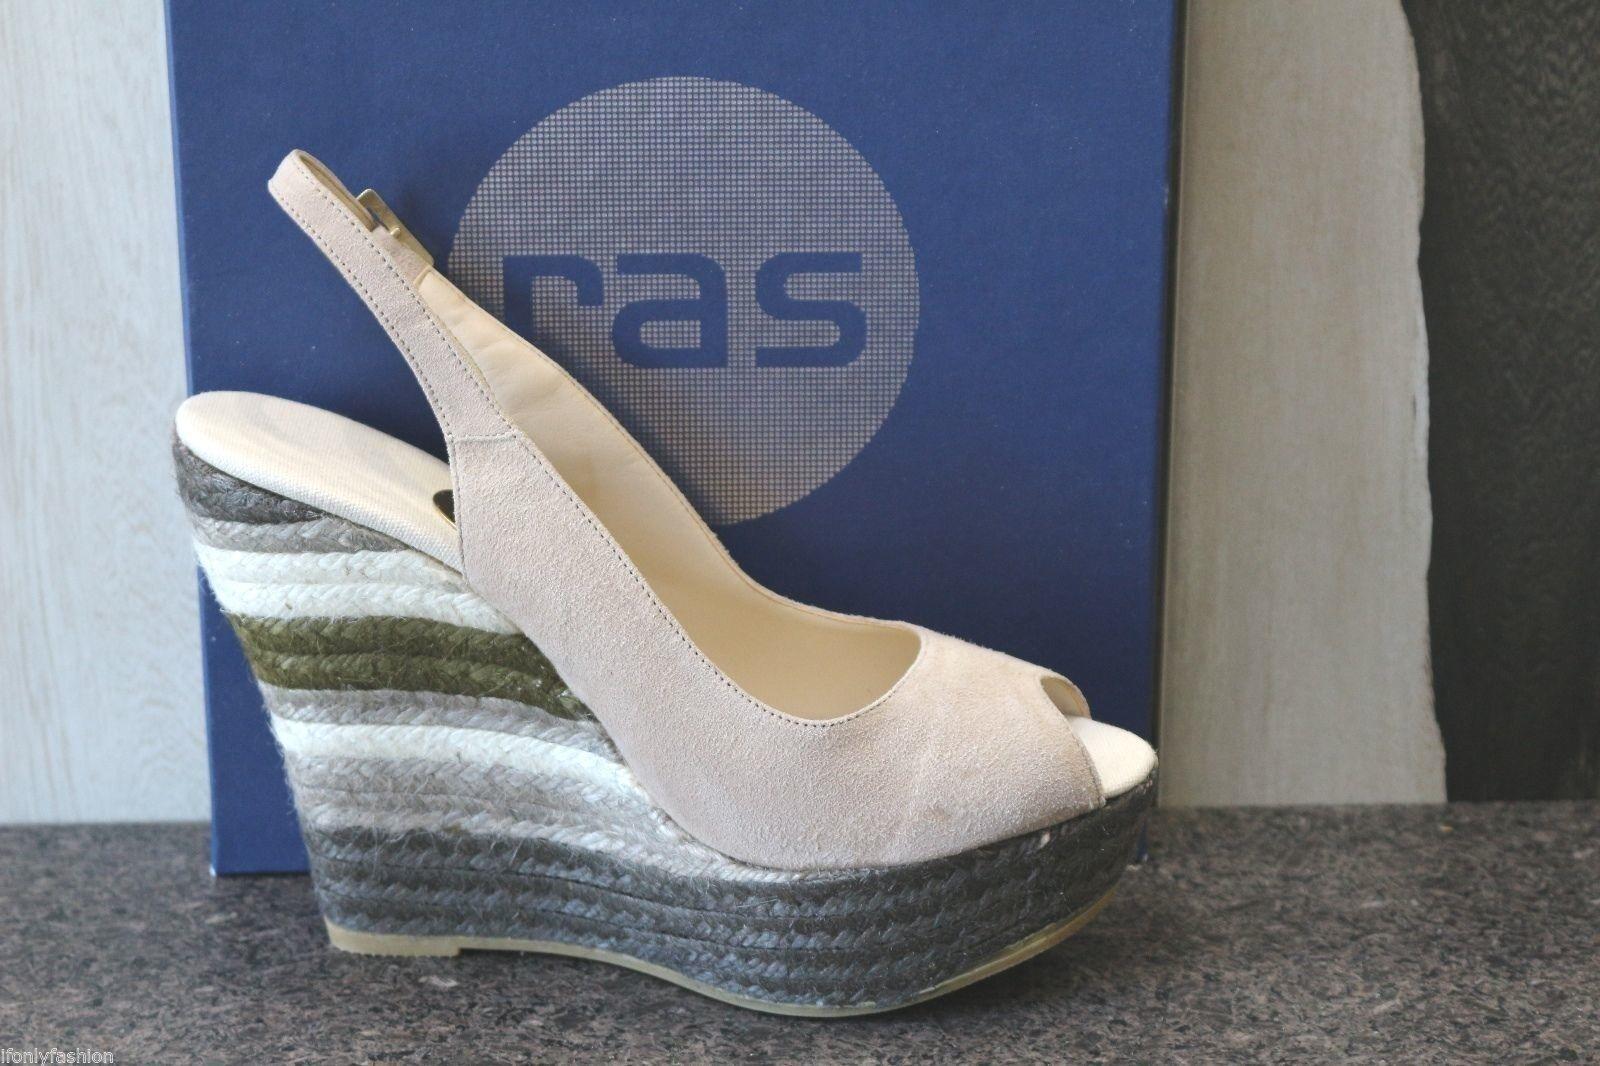 NIB RAS SPAIN BEIGE SUEDE Schuhes ESPADRILLES Wedge Platform Sandales Schuhes SUEDE 39 292e98